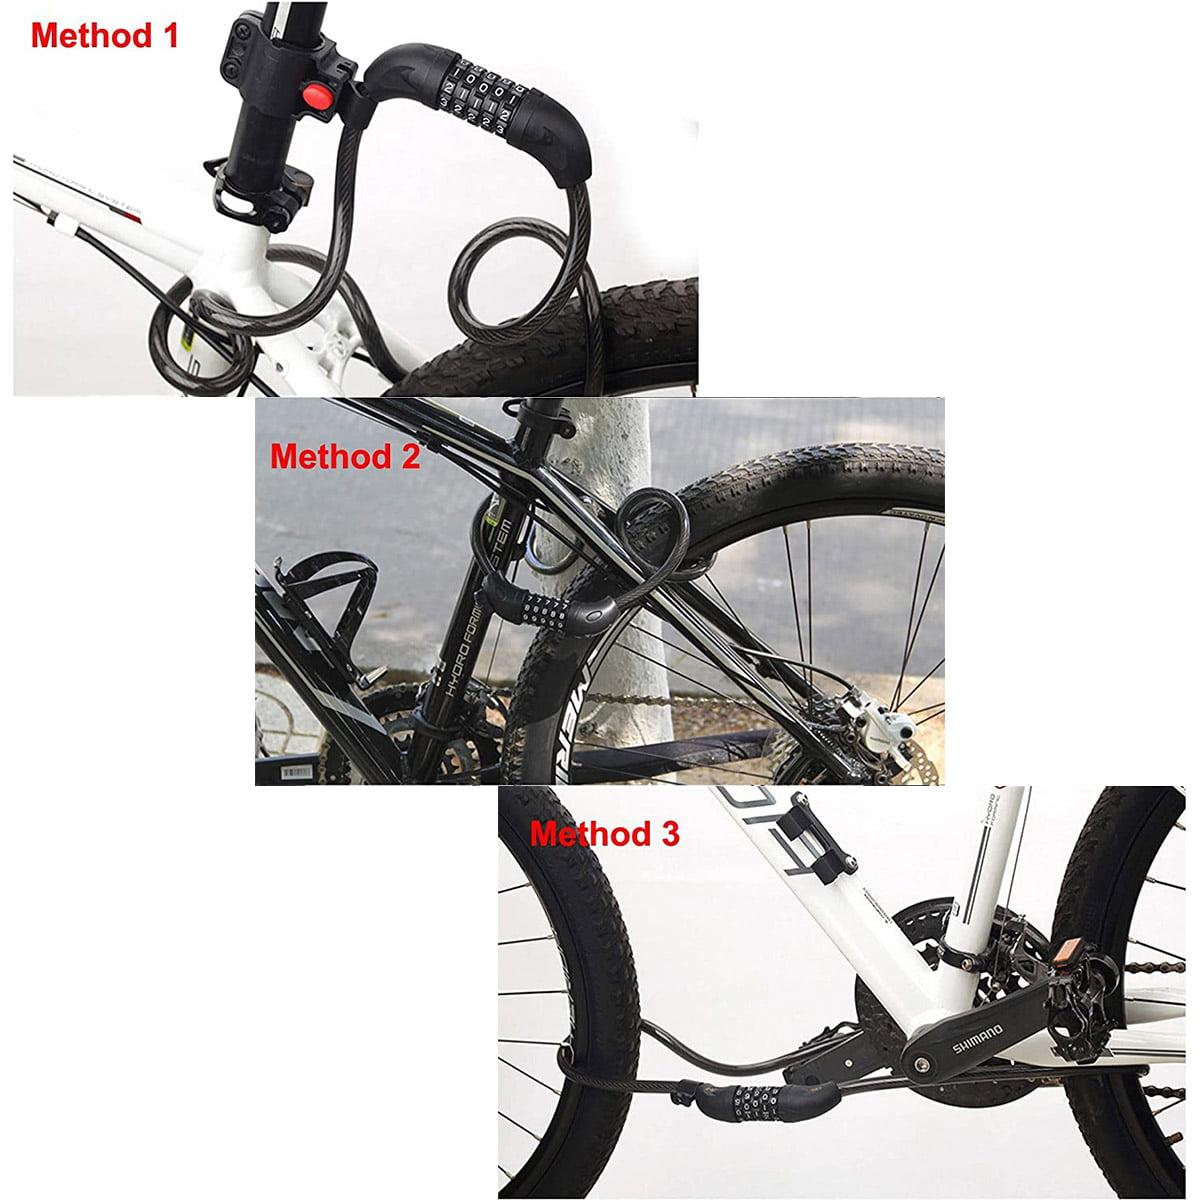 Bike Lock 5-Digit Ressetable Combination Chain Bicycle Lock 6Ft+Mounting Bracket